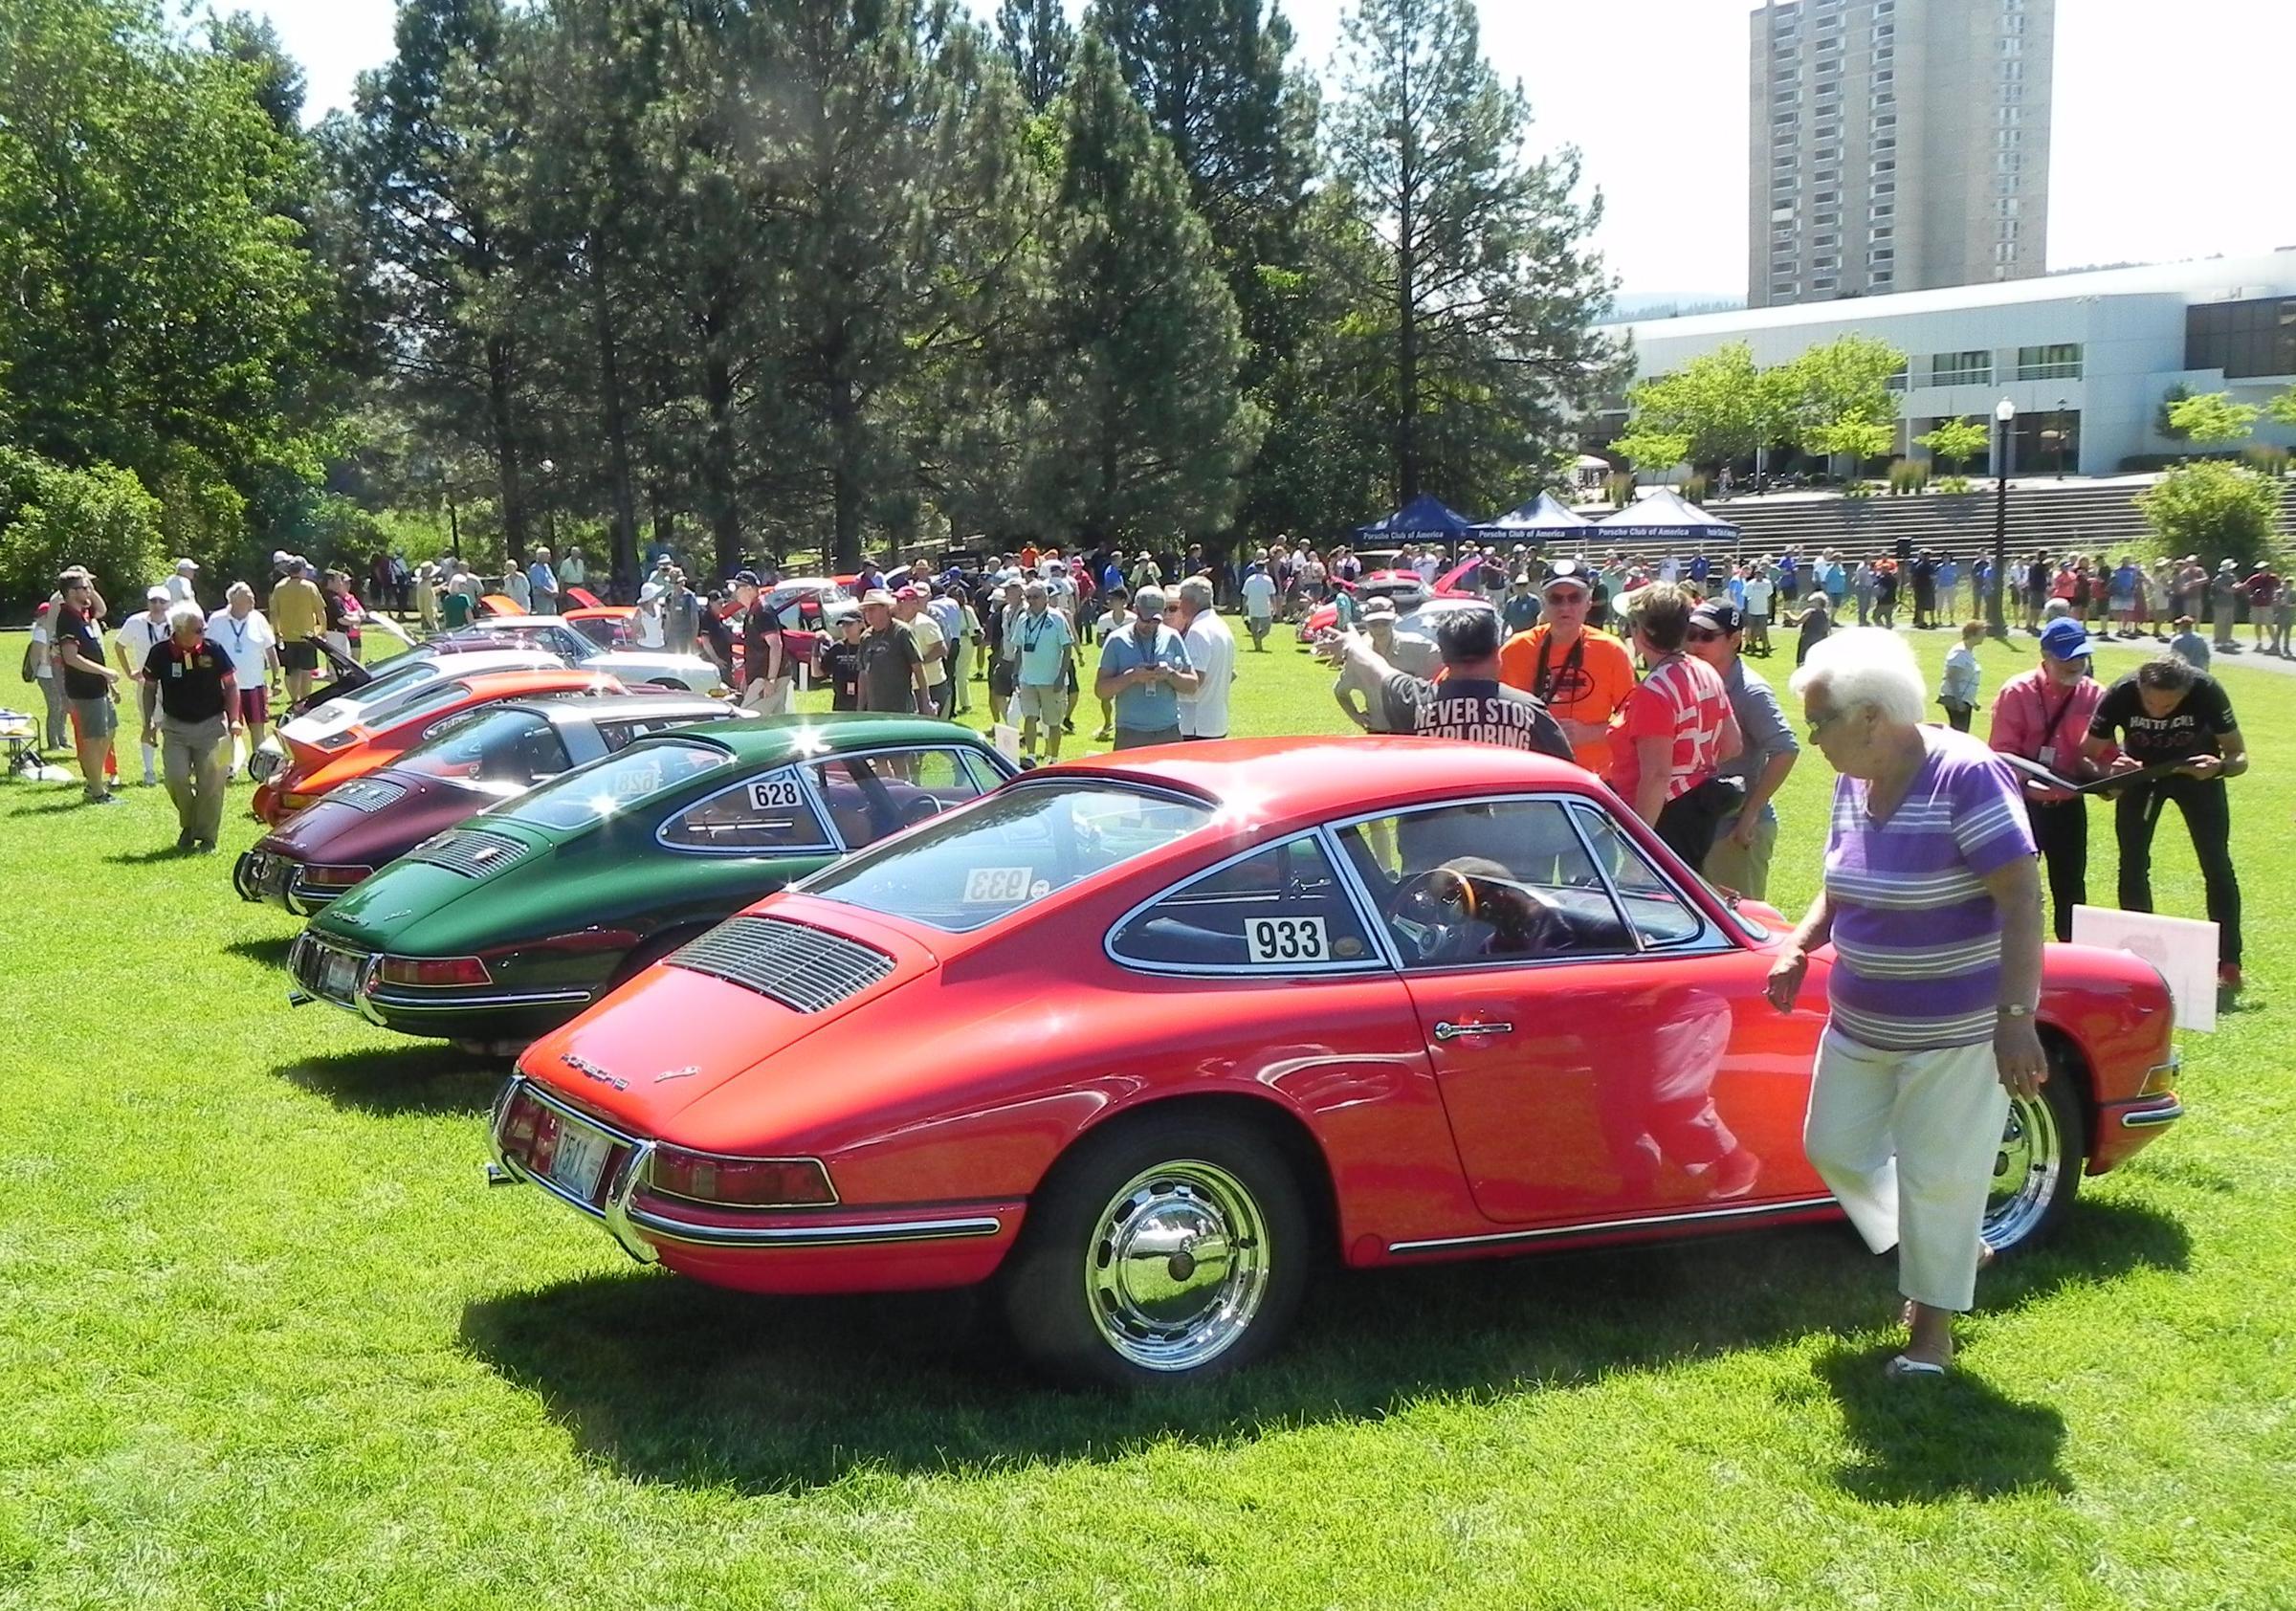 National Porsche Parade Visits Spokane | Spokane Public Radio